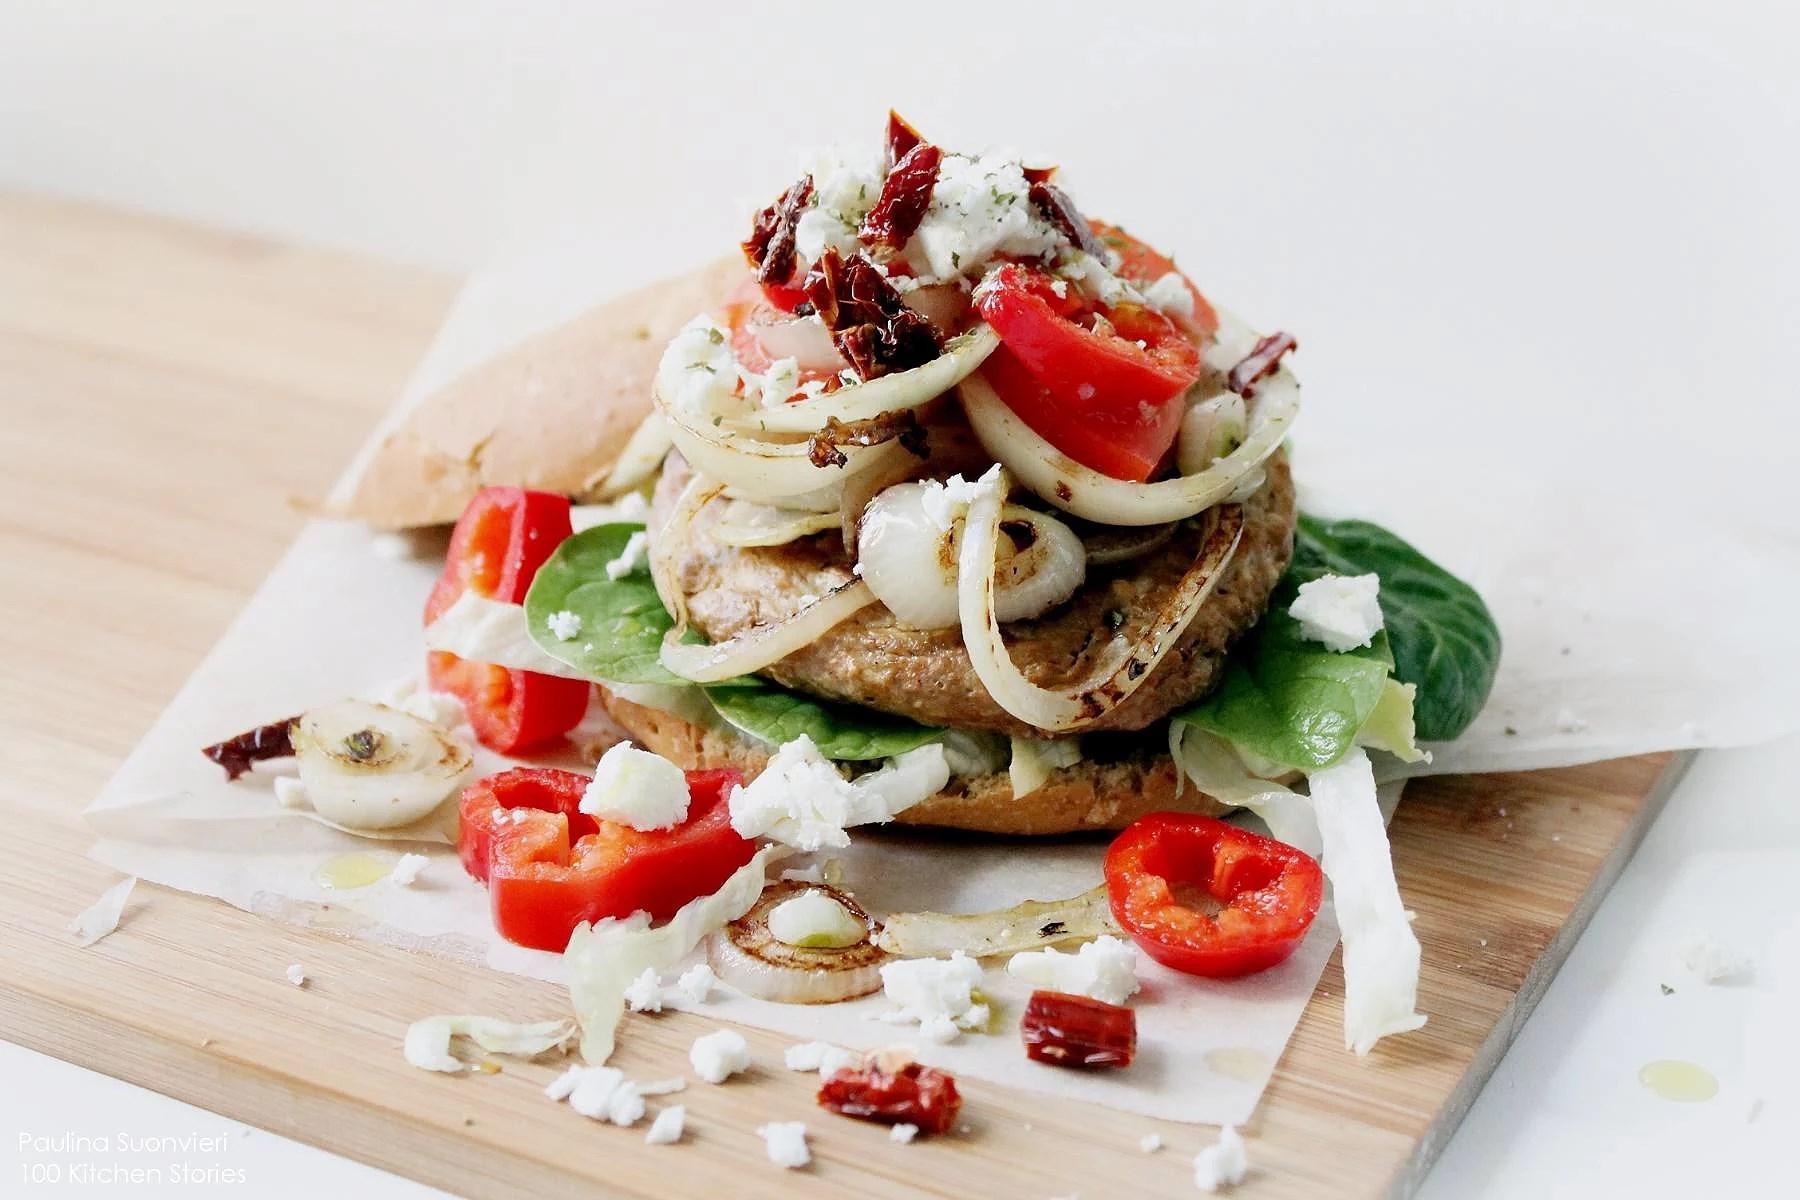 Veg Burger with Sundried Tomatoes, Feta Cheese and Oregano